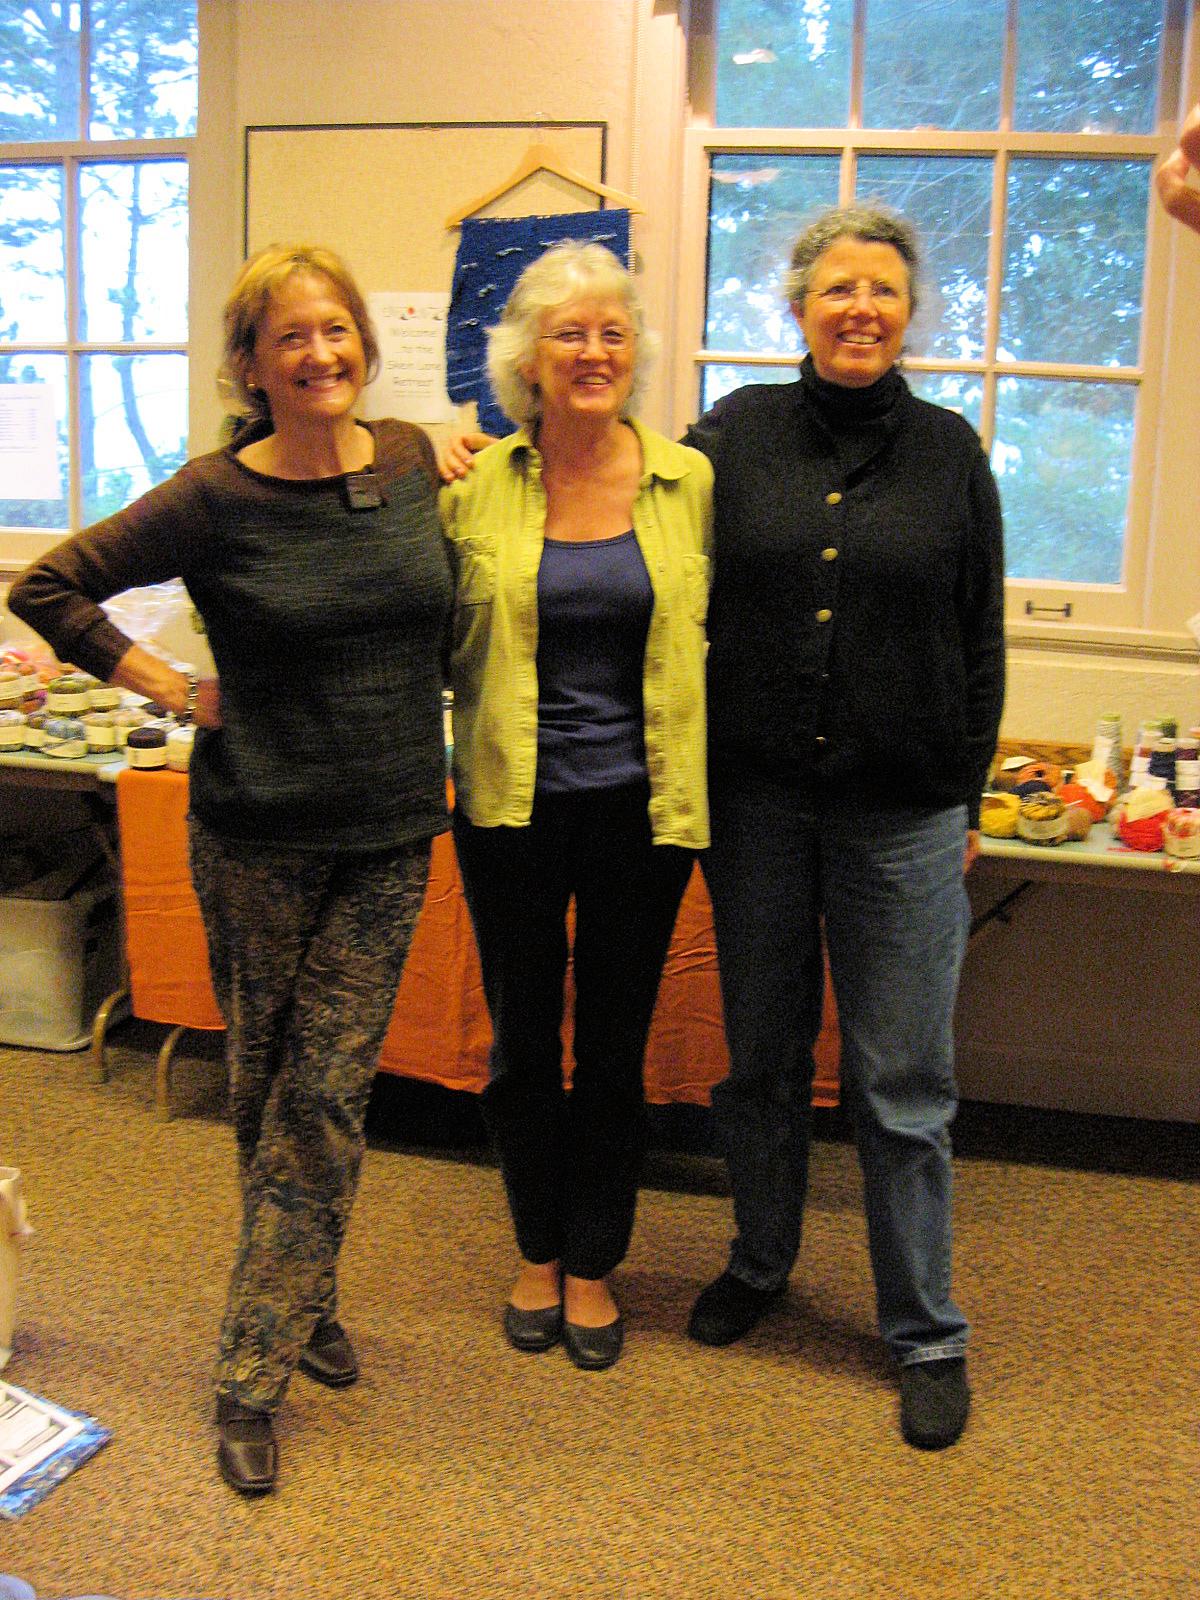 Sally, Carolyn, and Nancy